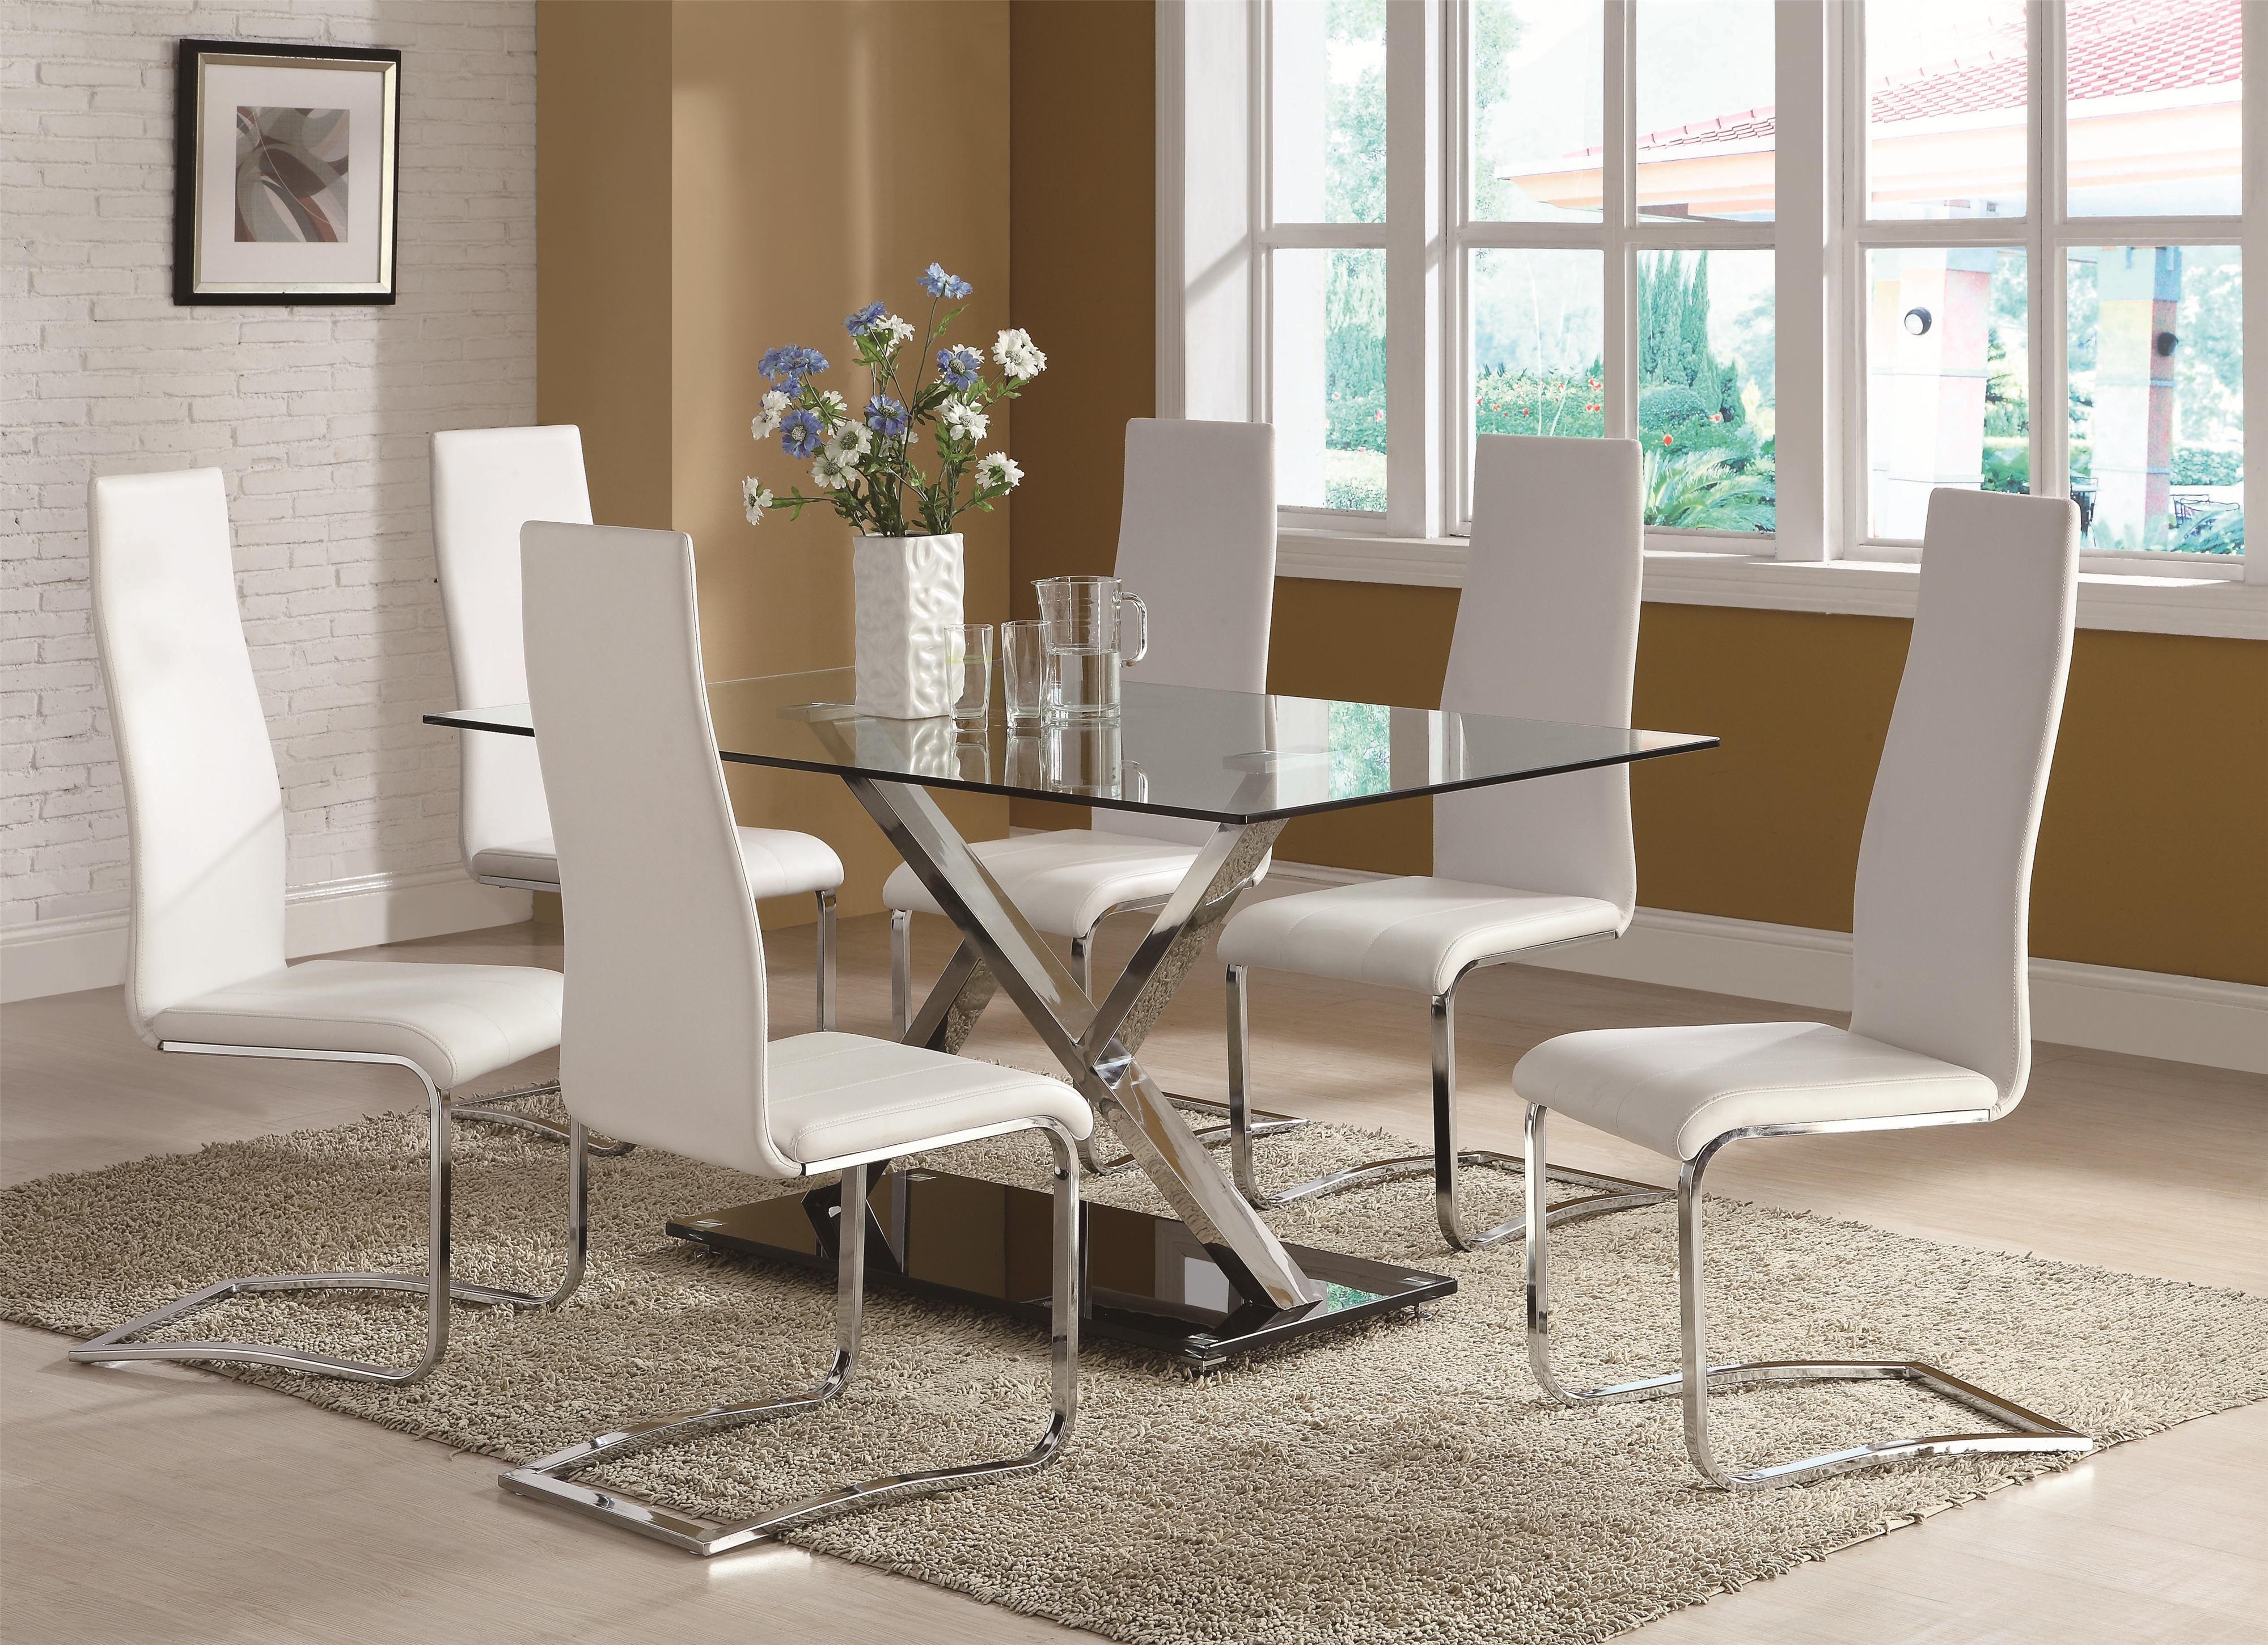 Wood Modern Dining Room Ideas Interior Design Inspiration